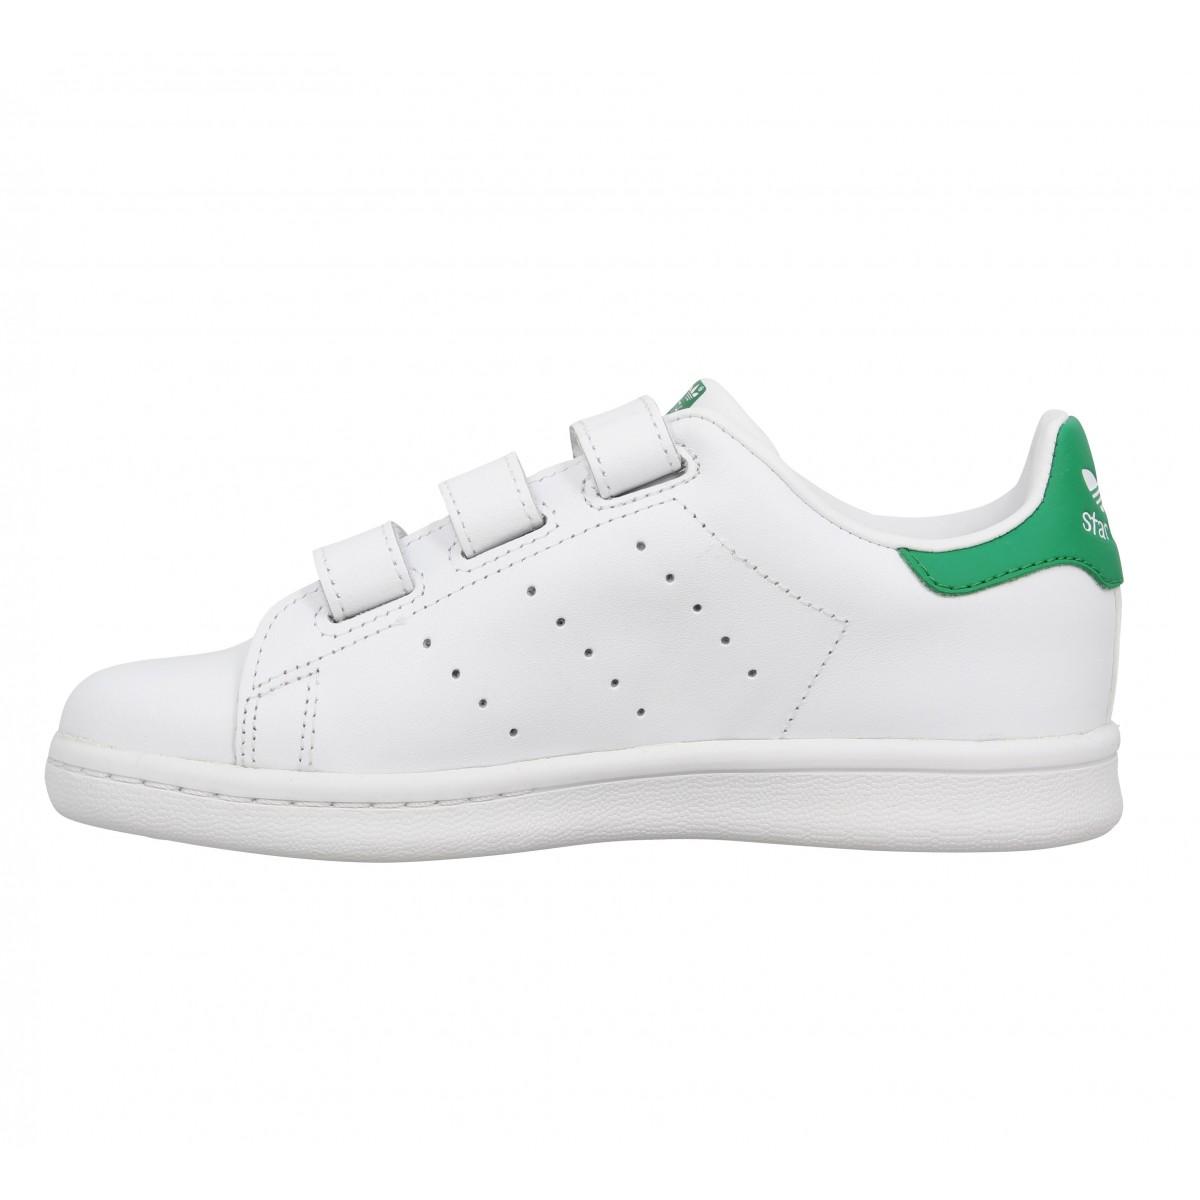 adidas stan smith ii cuir enfant blanc vert fanny chaussures. Black Bedroom Furniture Sets. Home Design Ideas